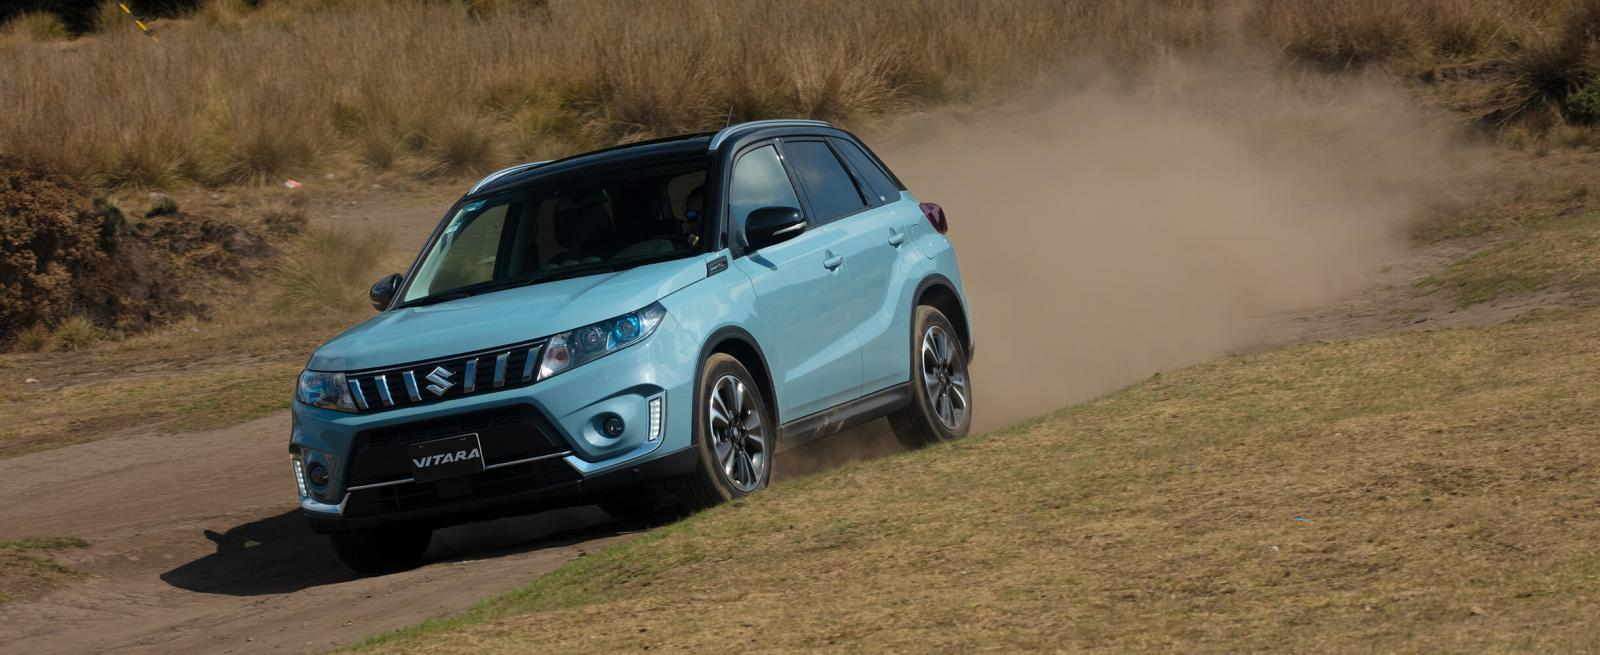 Suzuki Vitara Booterjet All Grip 2021 resena opiniones